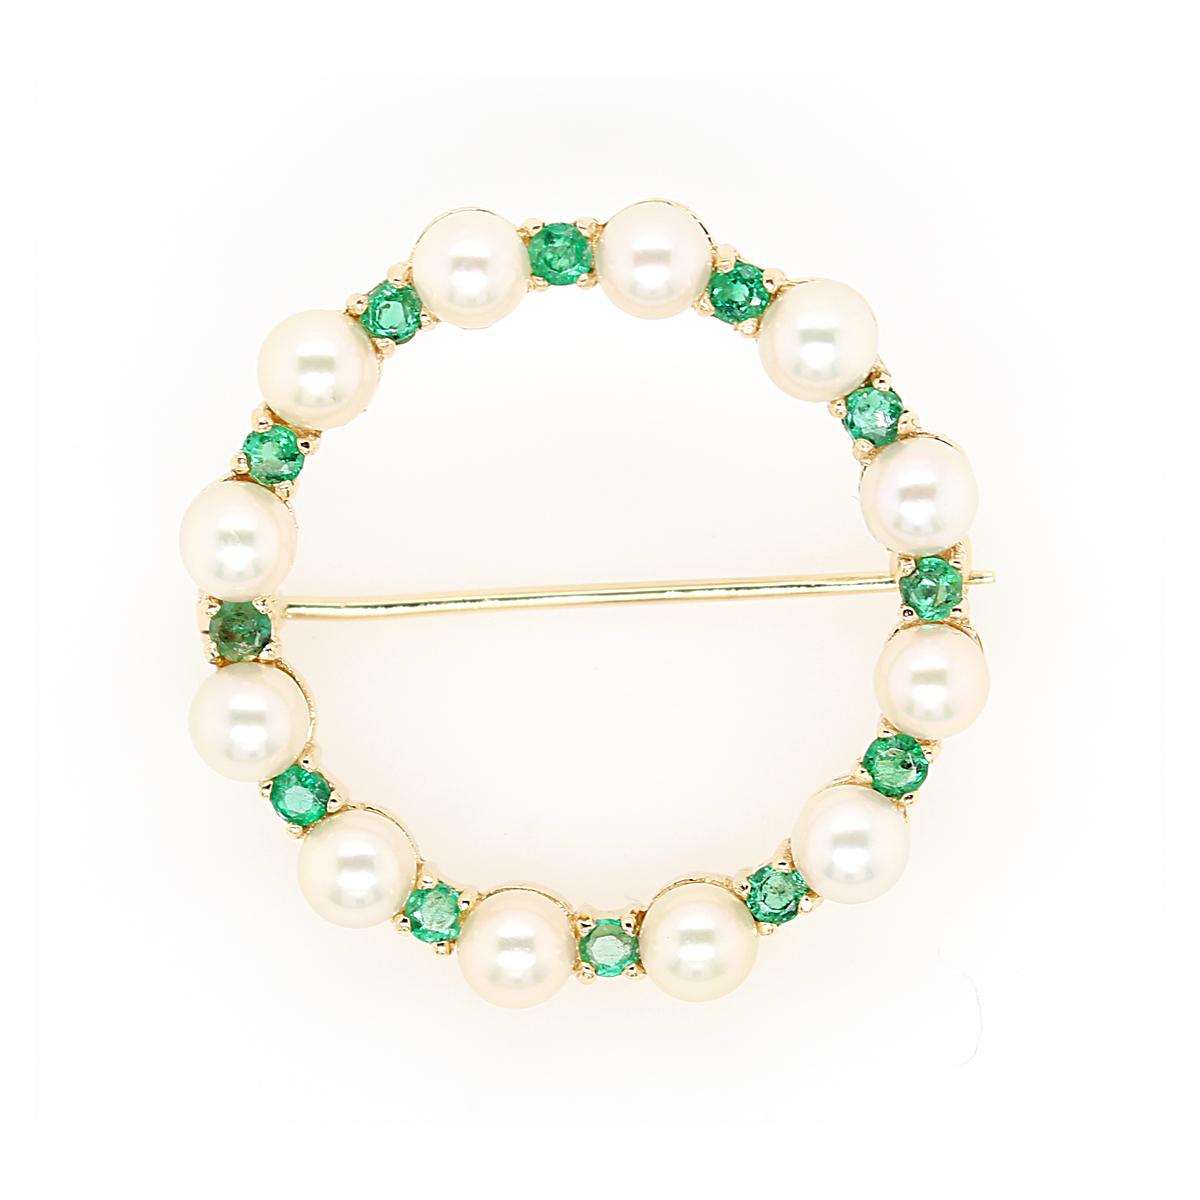 Vintage Lady's 14 Karat Yellow Gold Emerald and Pearl Circle Pin